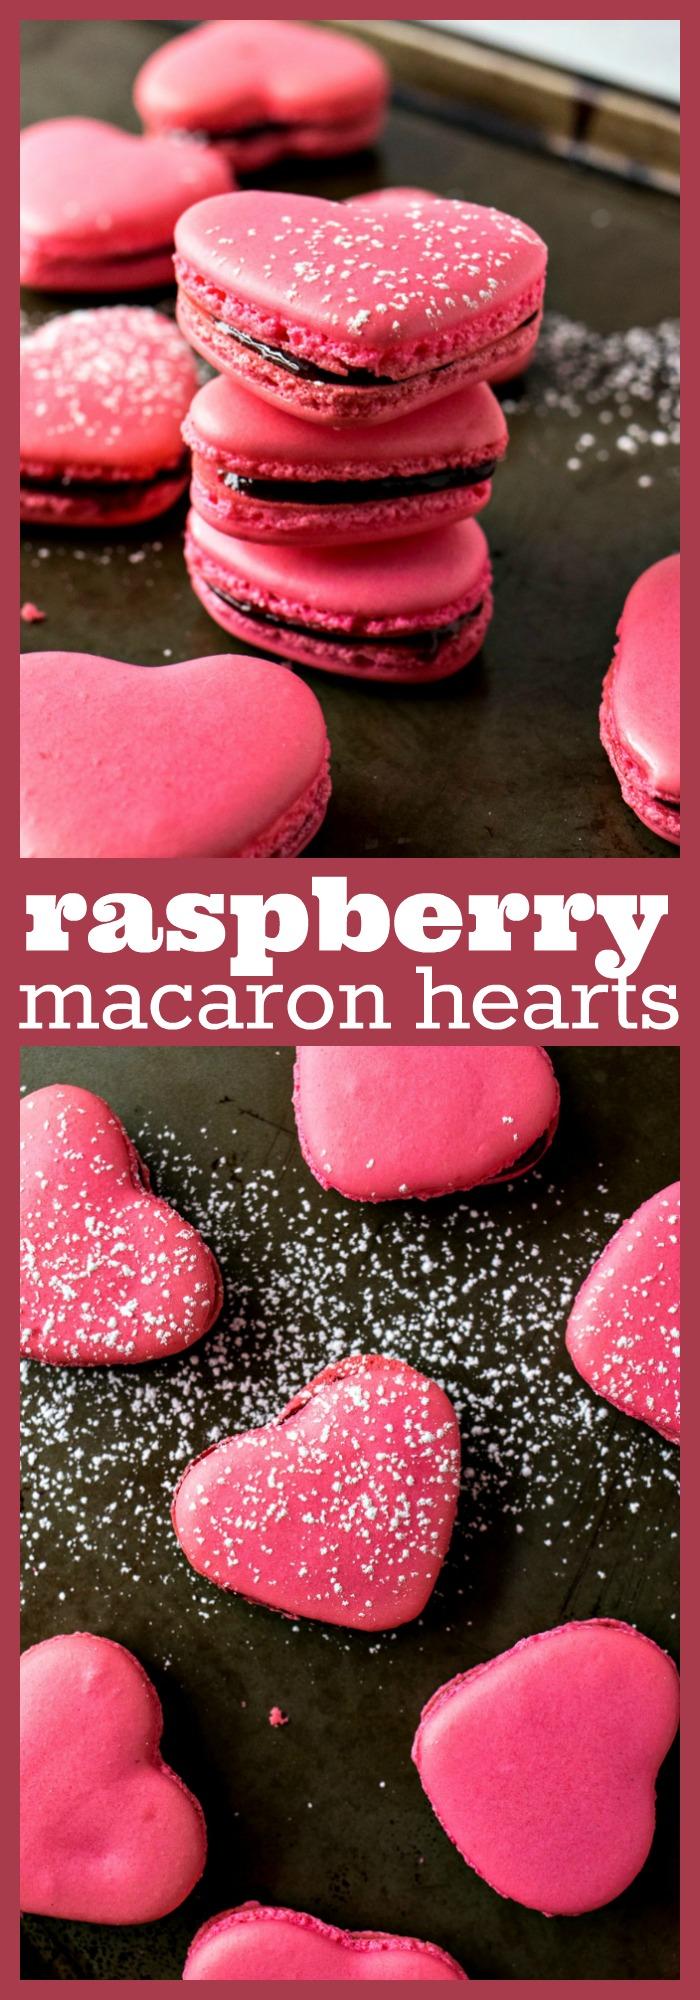 Raspberry Macaron Hearts photo collage